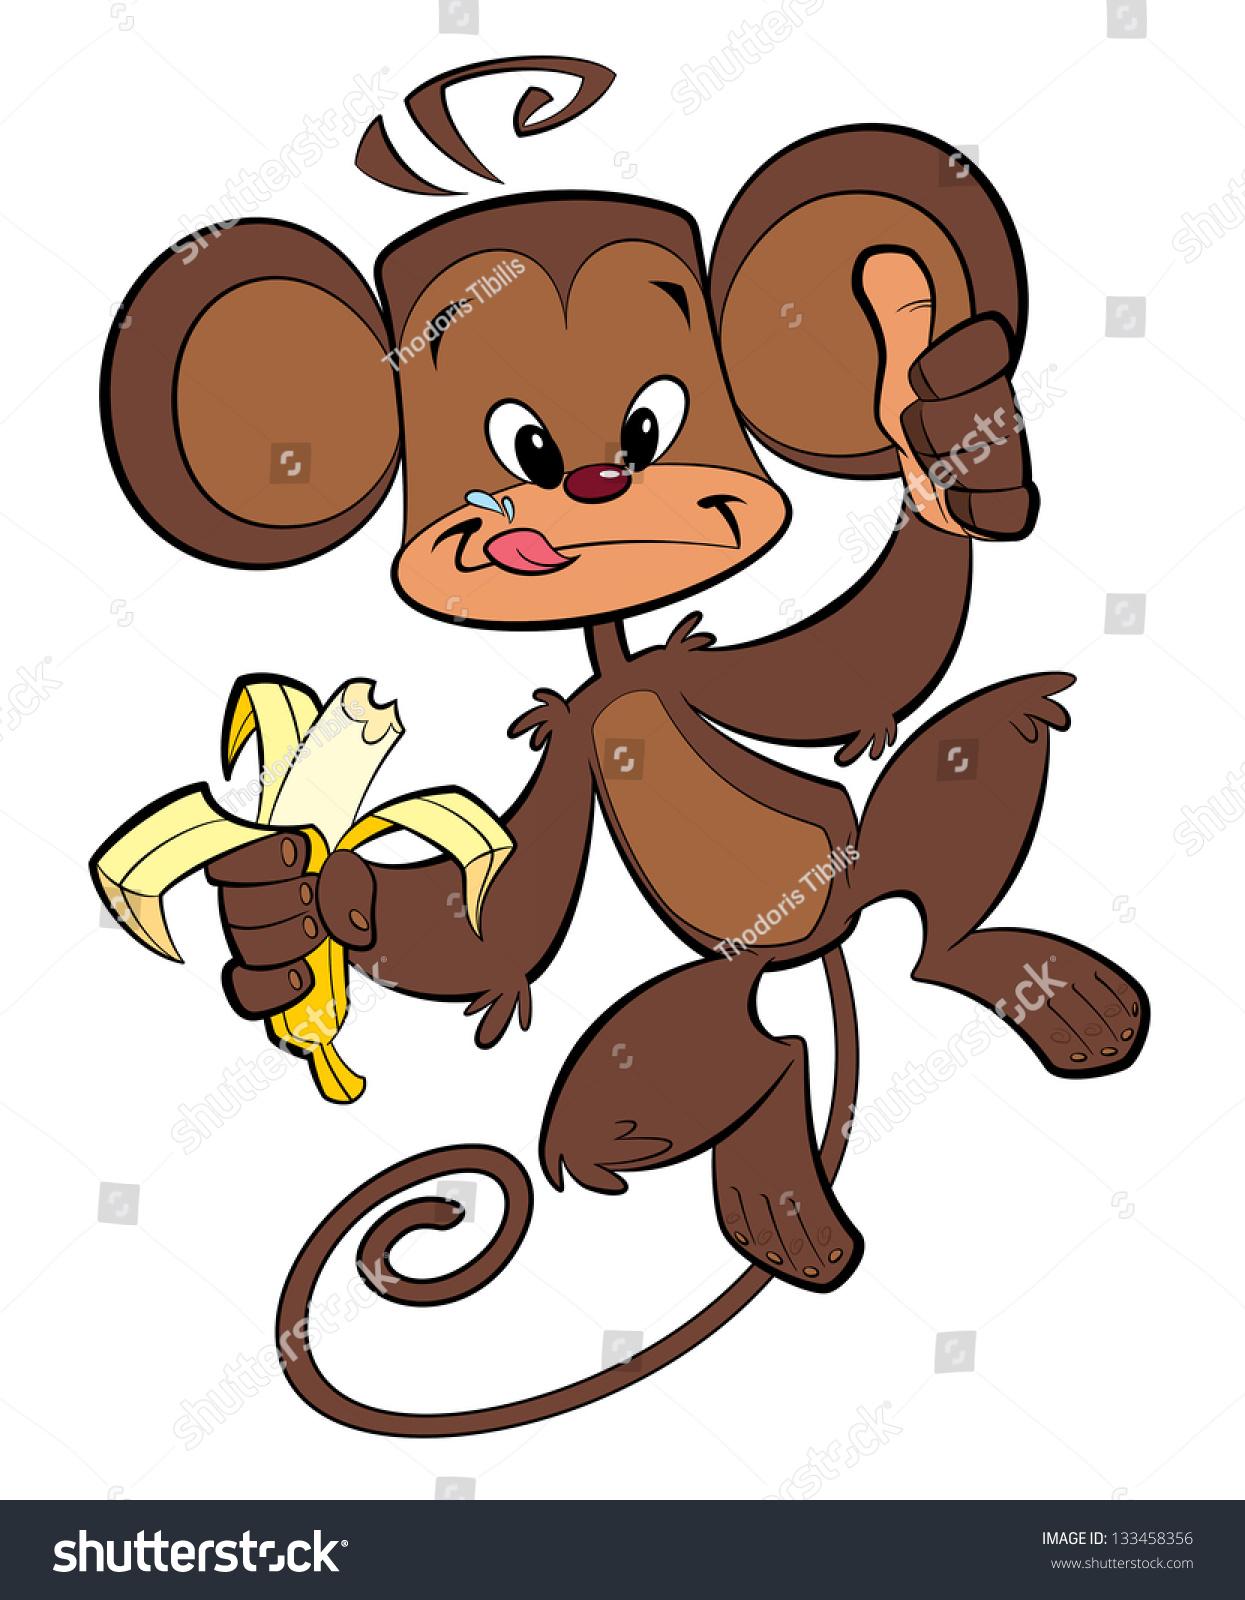 cartoon brown happy monkey eating banana stock illustration